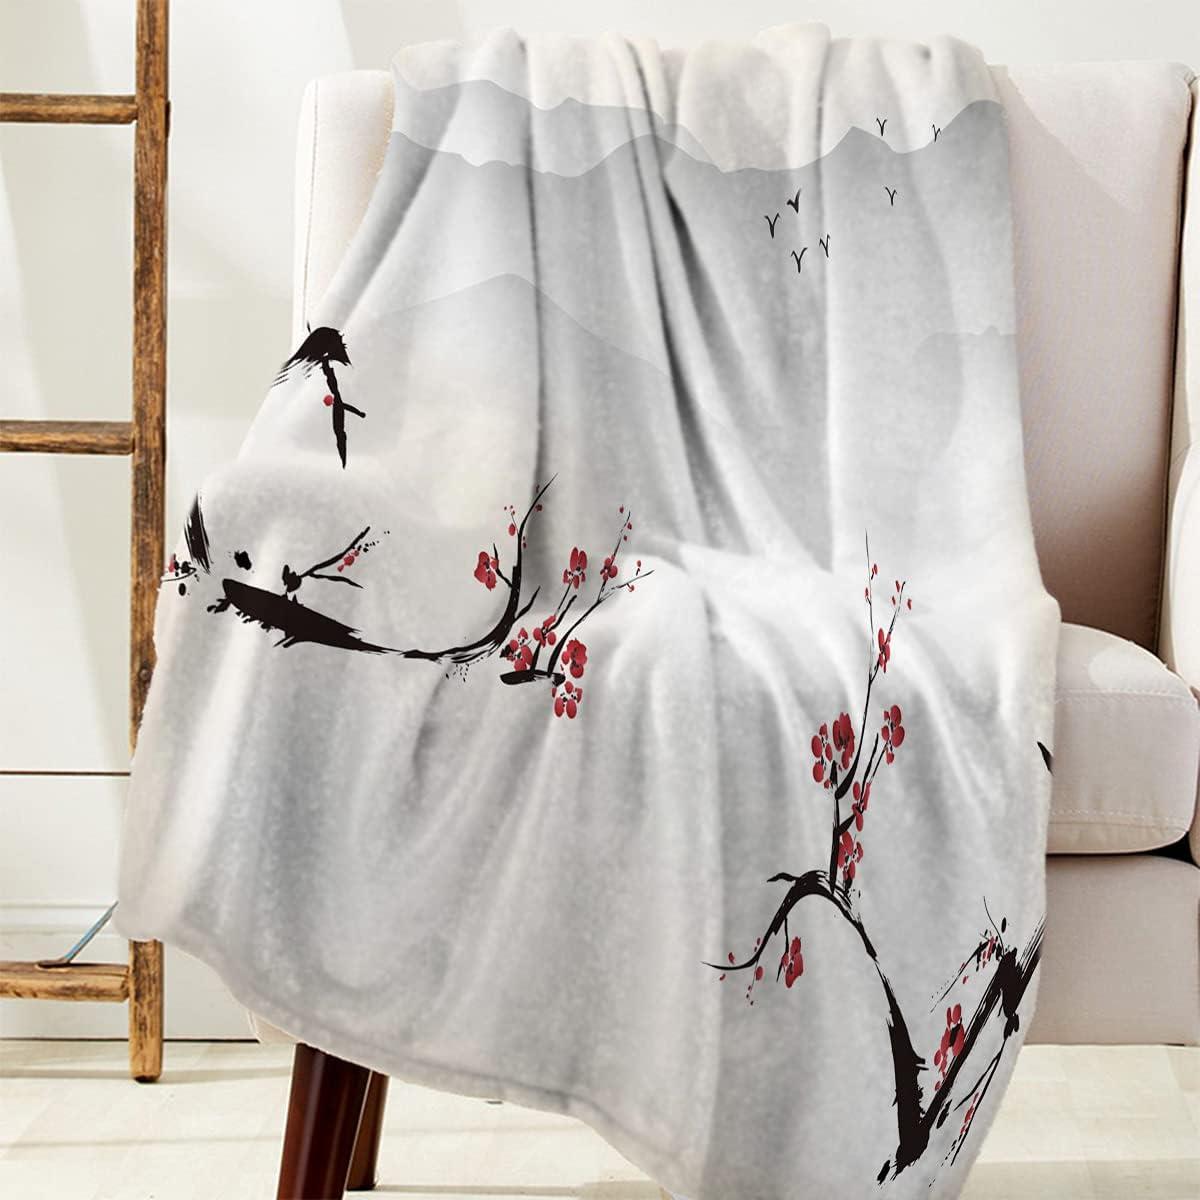 All Season Bed Blanket Flannel Fleece for S Blankets Couch overseas Under blast sales Throw